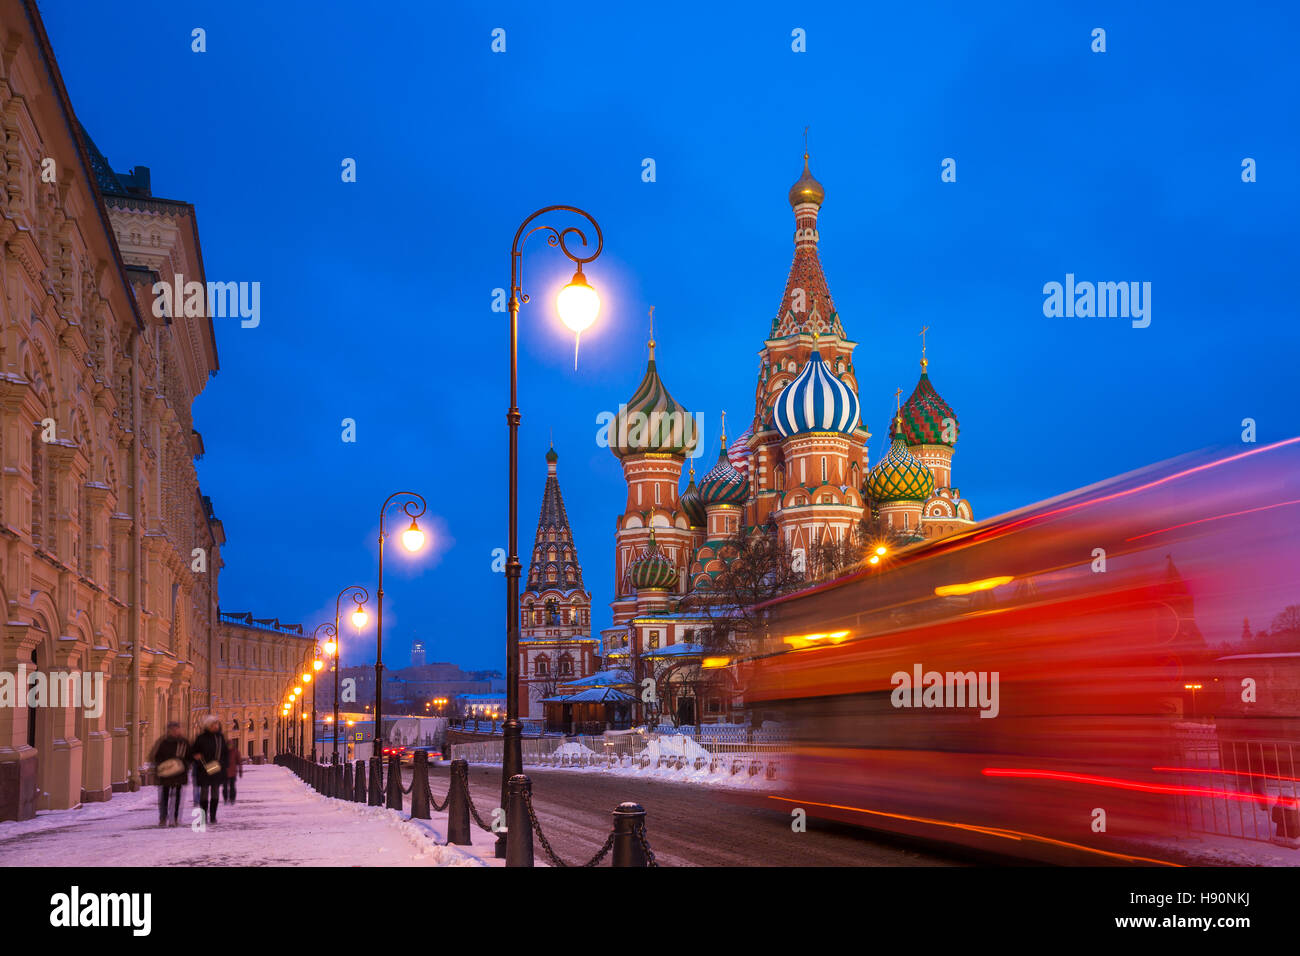 Roten Touristenbus, vorbei an St. Basils Cathedral bei Dämmerung, Roter Platz, Moskau, Russland Stockbild